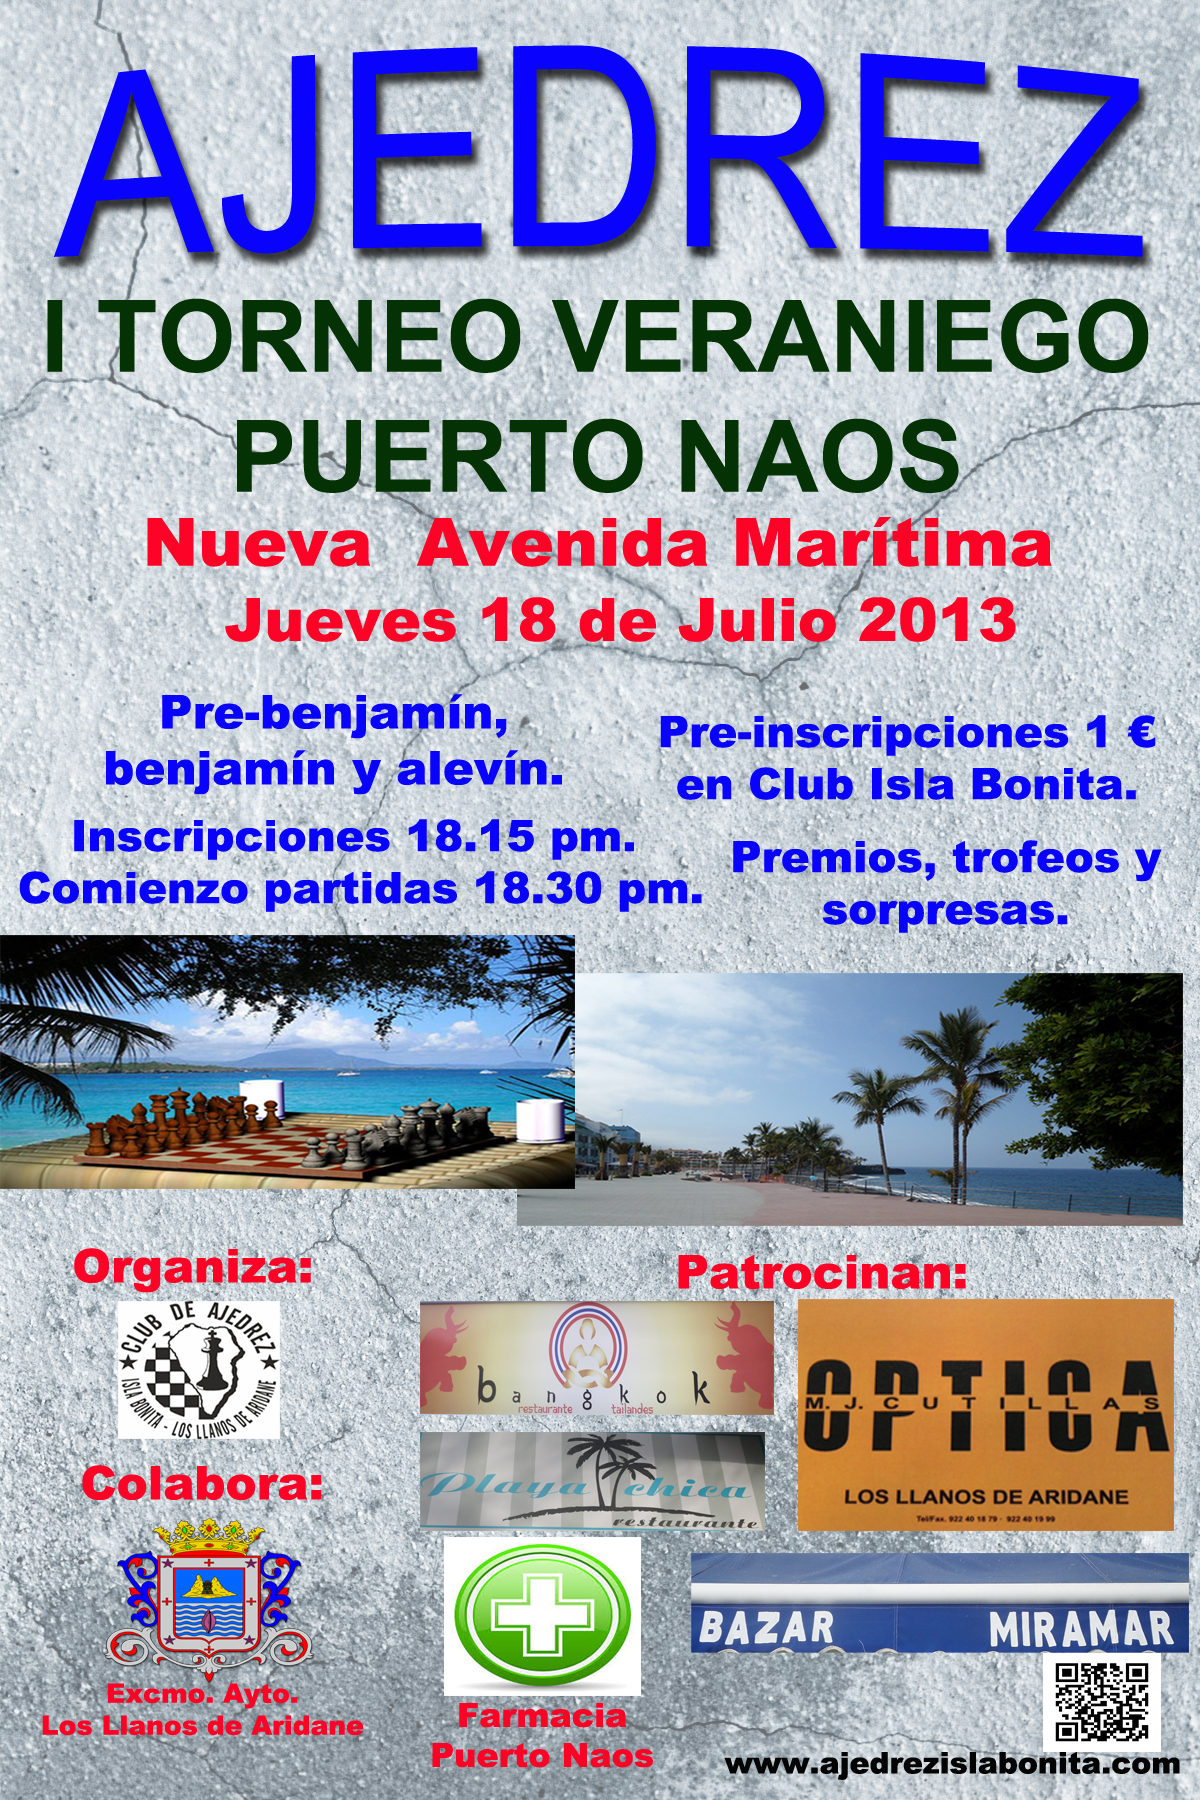 http://ajedrezlapalma.com/wp-content/uploads/2013/07/torneo_puertodenaos_2013.jpg